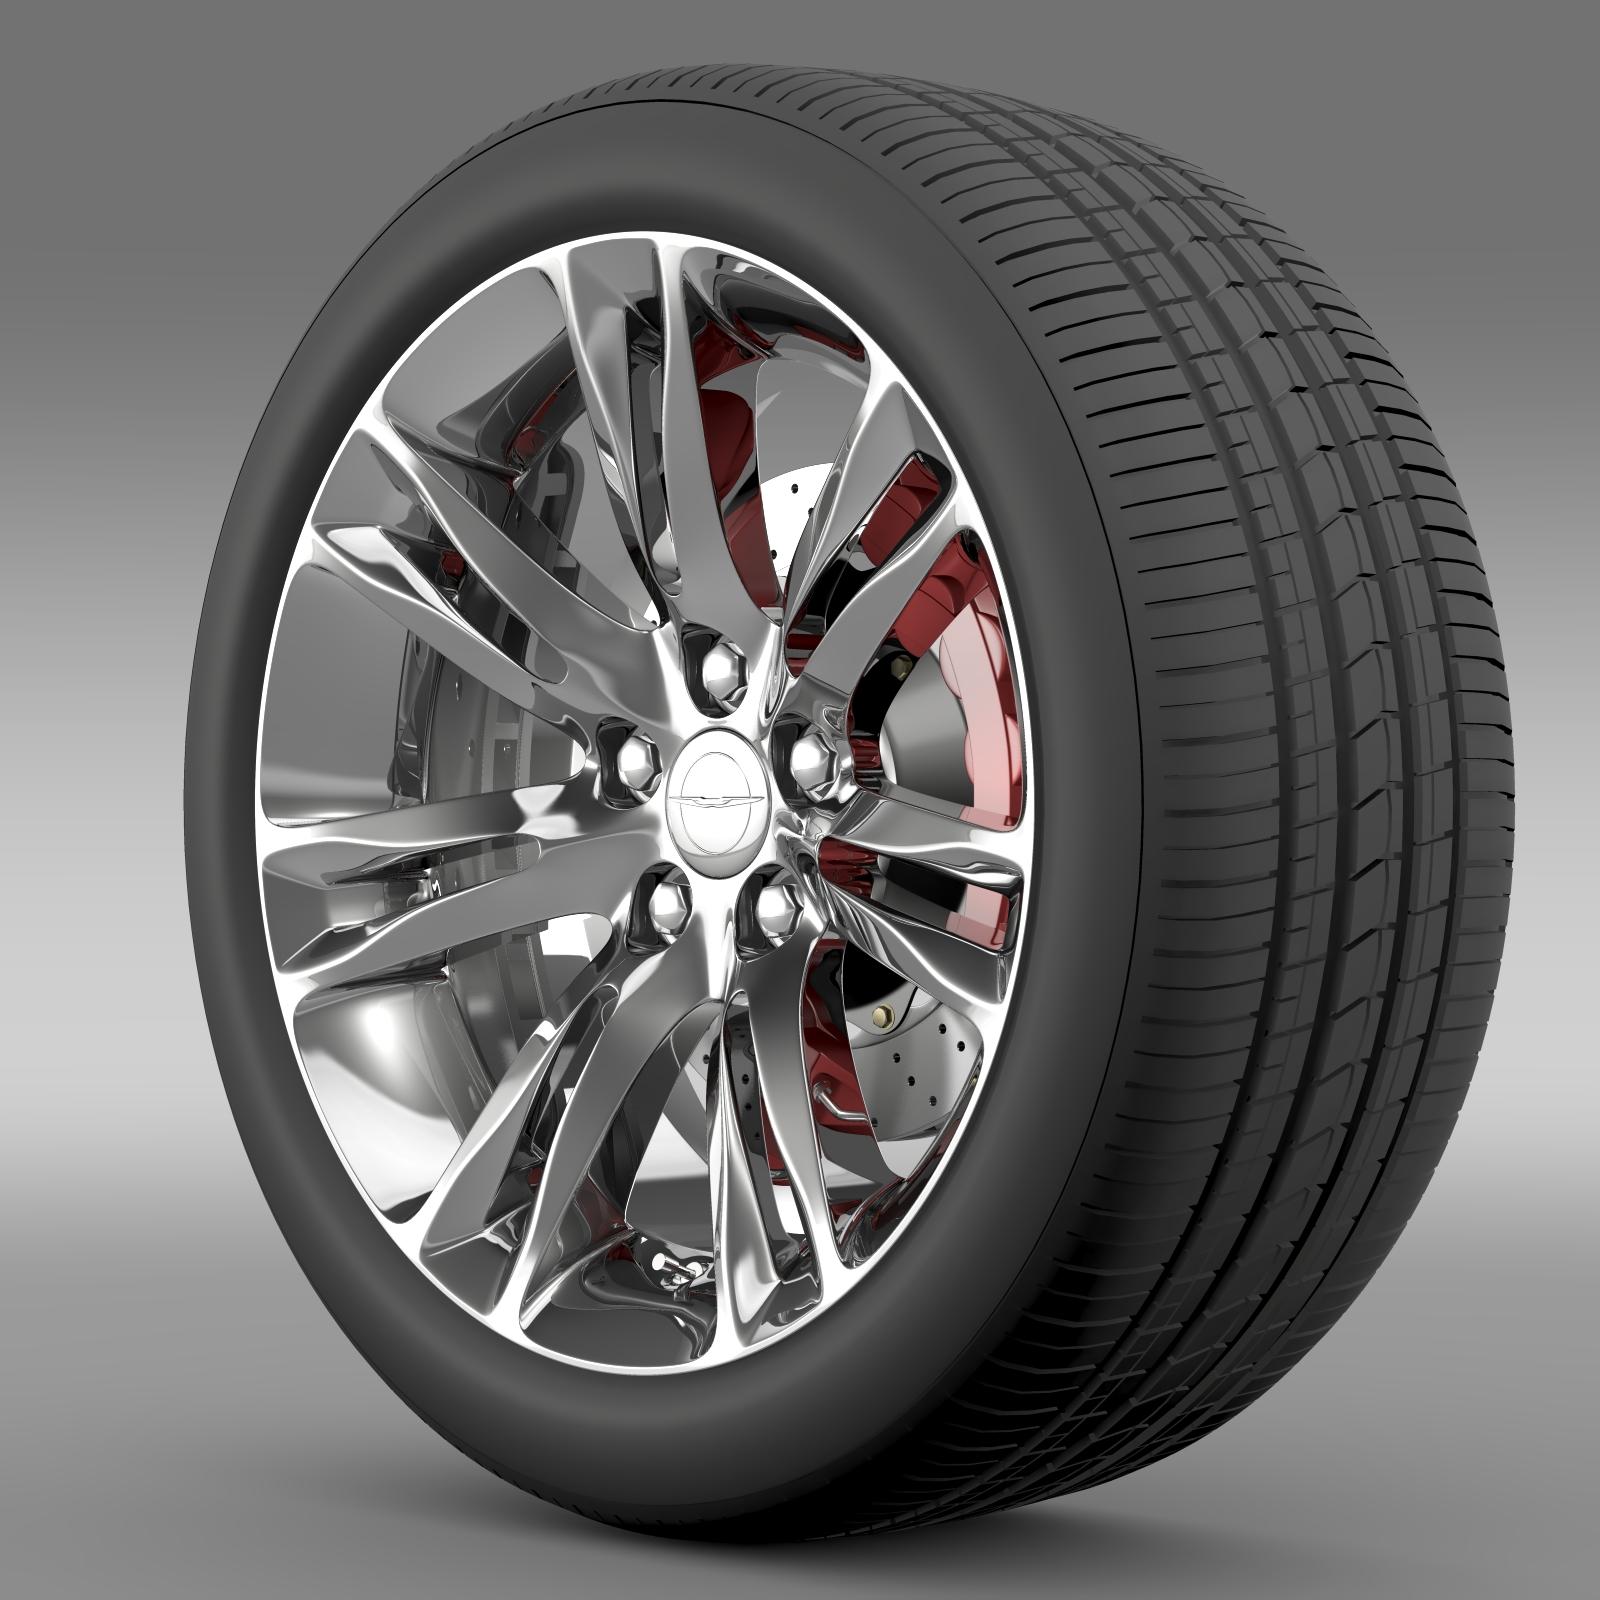 Chrysler 300C 2015 wheel 3d model 3ds max fbx c4d lwo lws lw ma mb  obj 212760